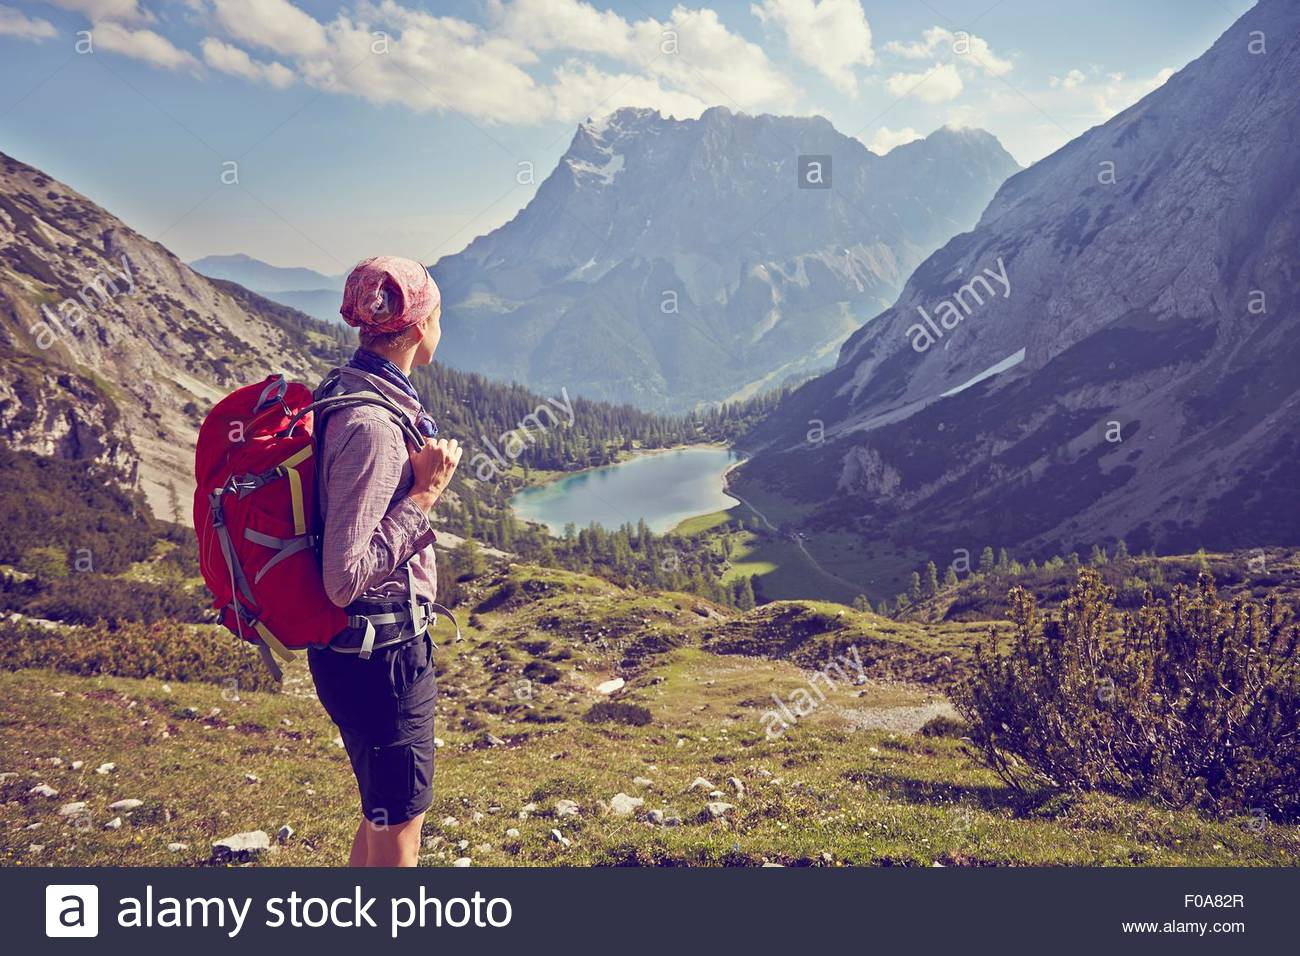 Reife Frau, Wandern, Berg, betrachten, Ehrwald, Tirol, Österreich Stockbild